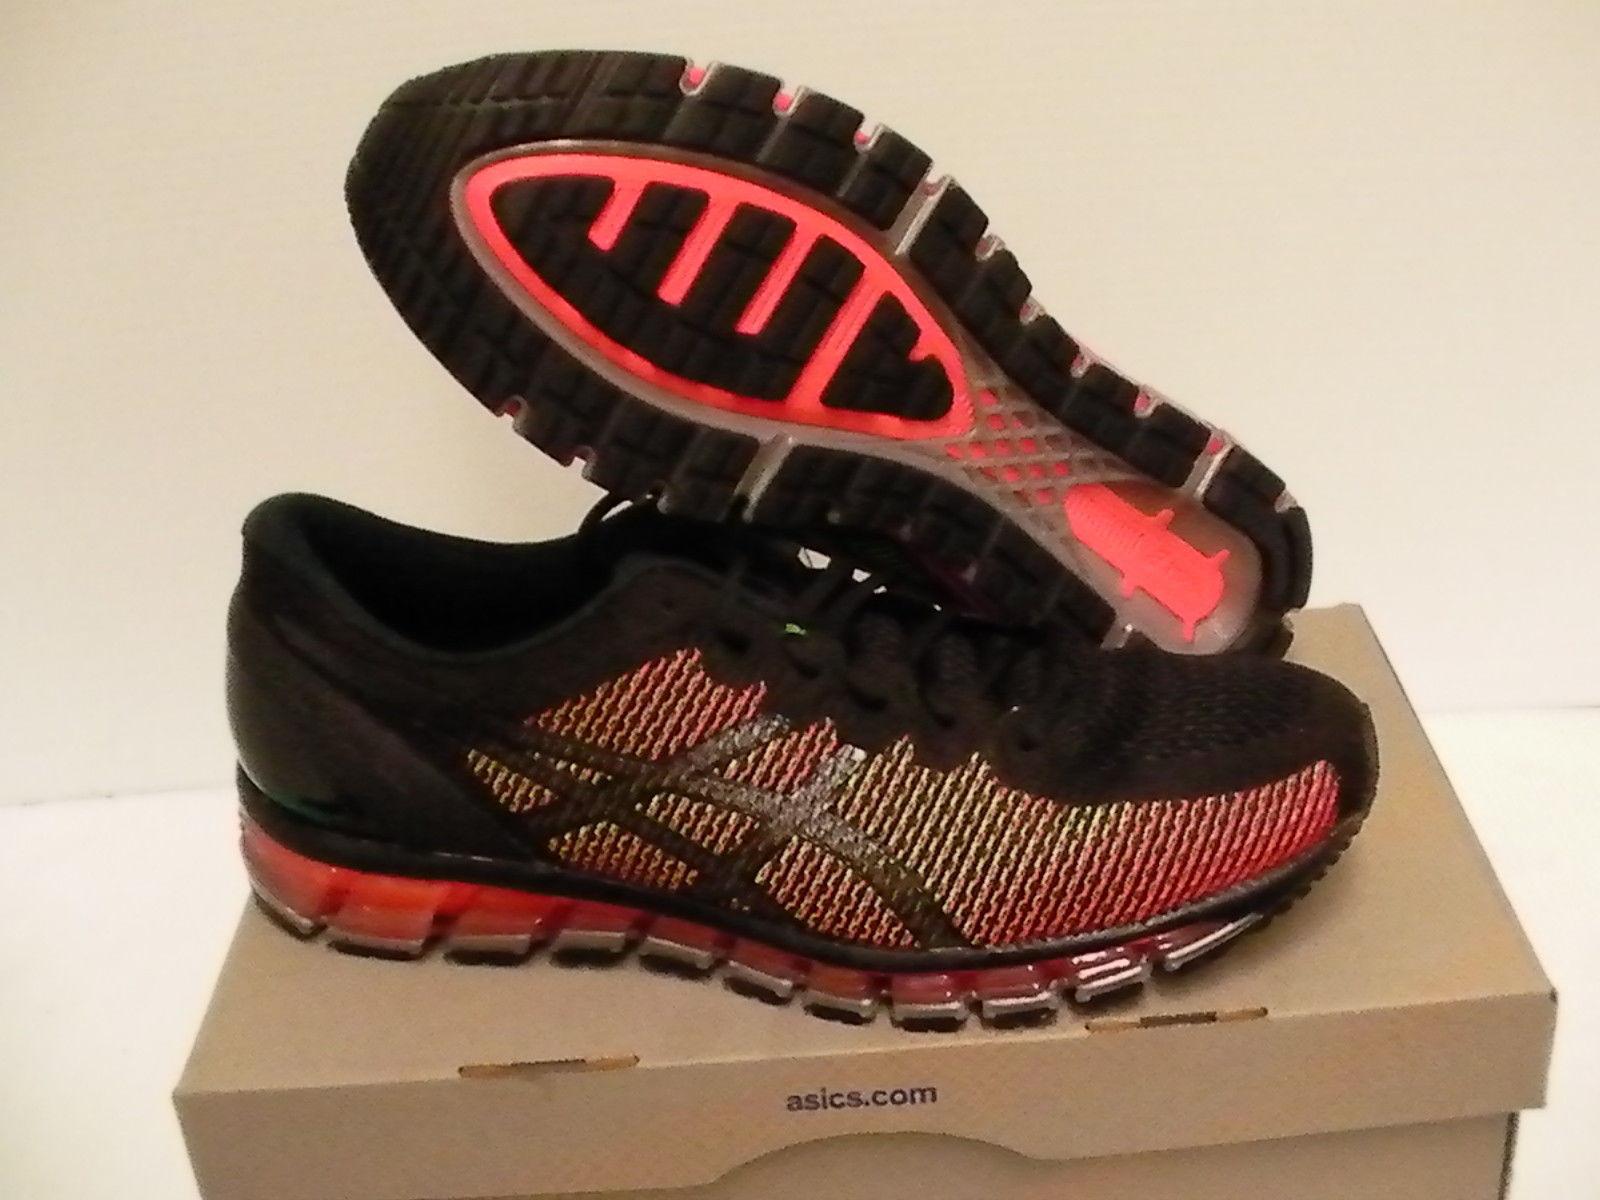 4db7439beee64 Asics men's running shoes gel quantum 360 cm and 50 similar items